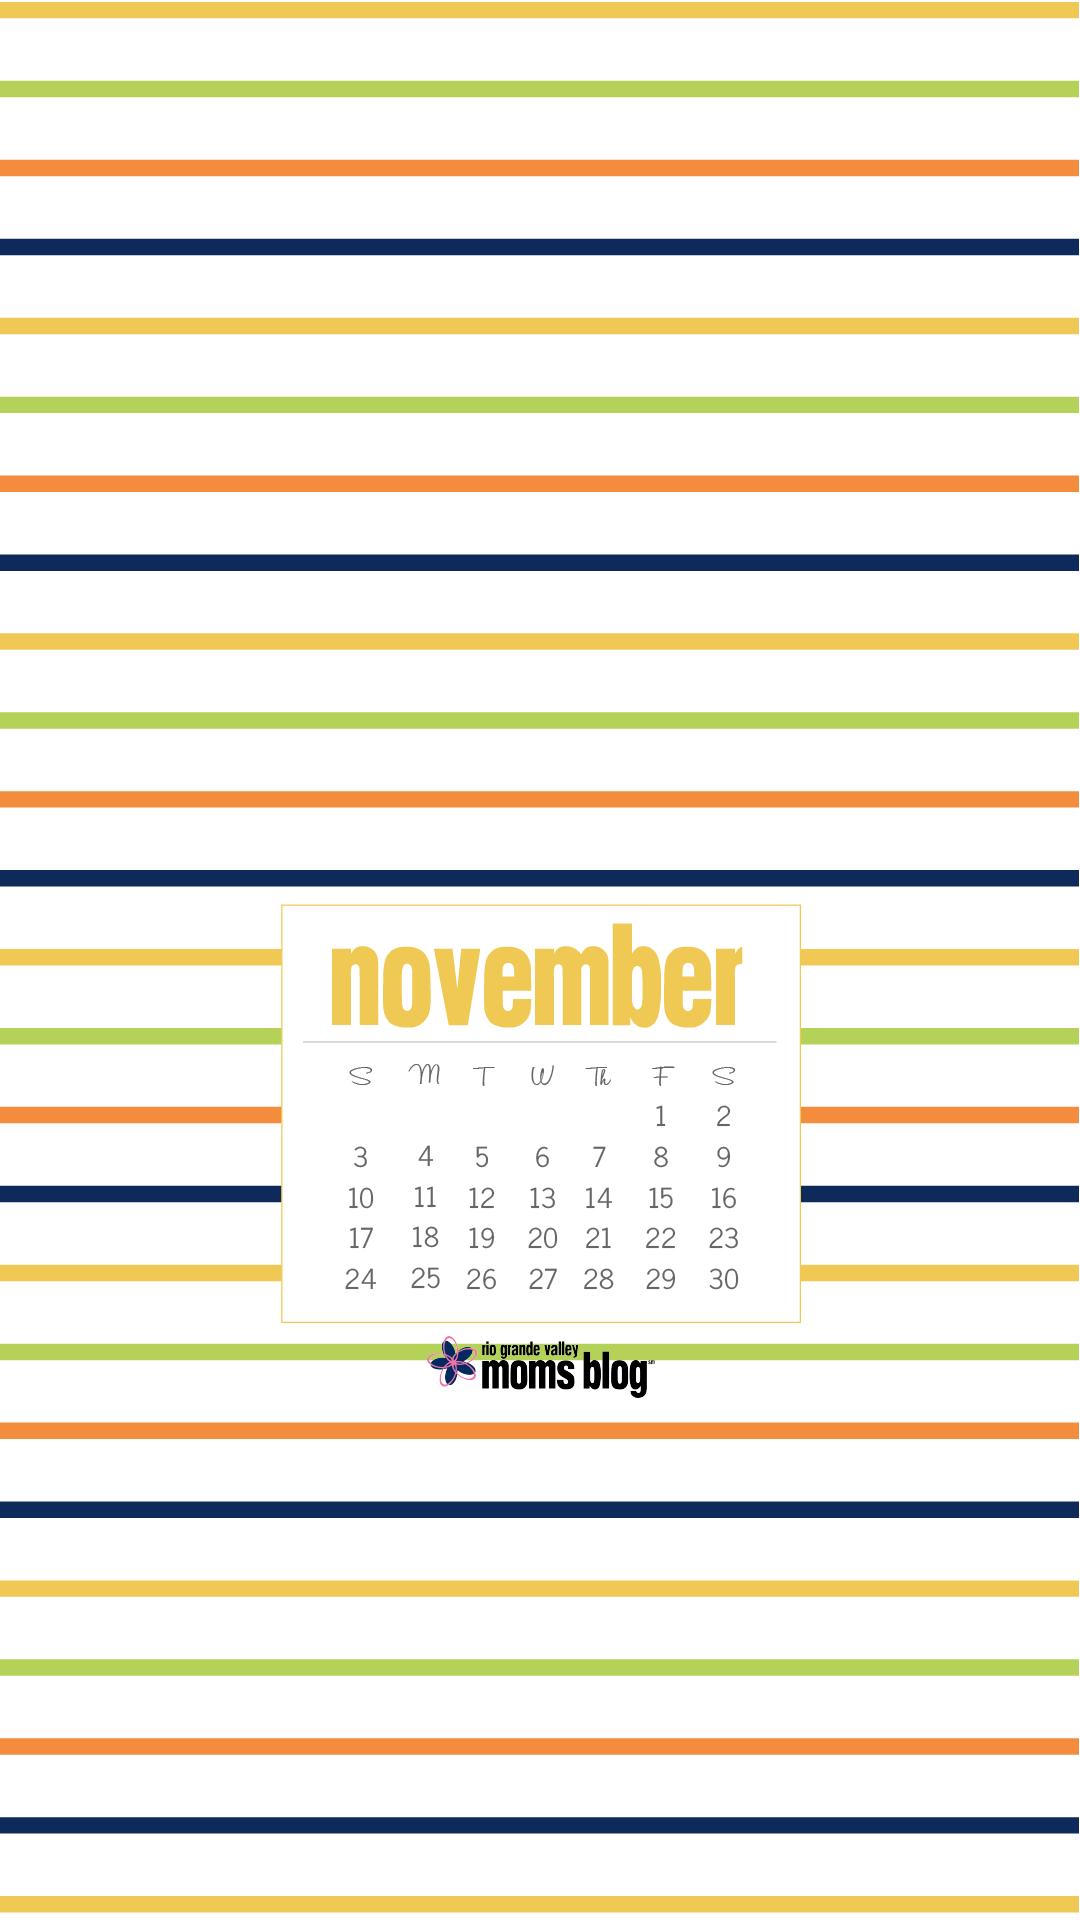 RGVMB November 2019 - Calendar - Stripes